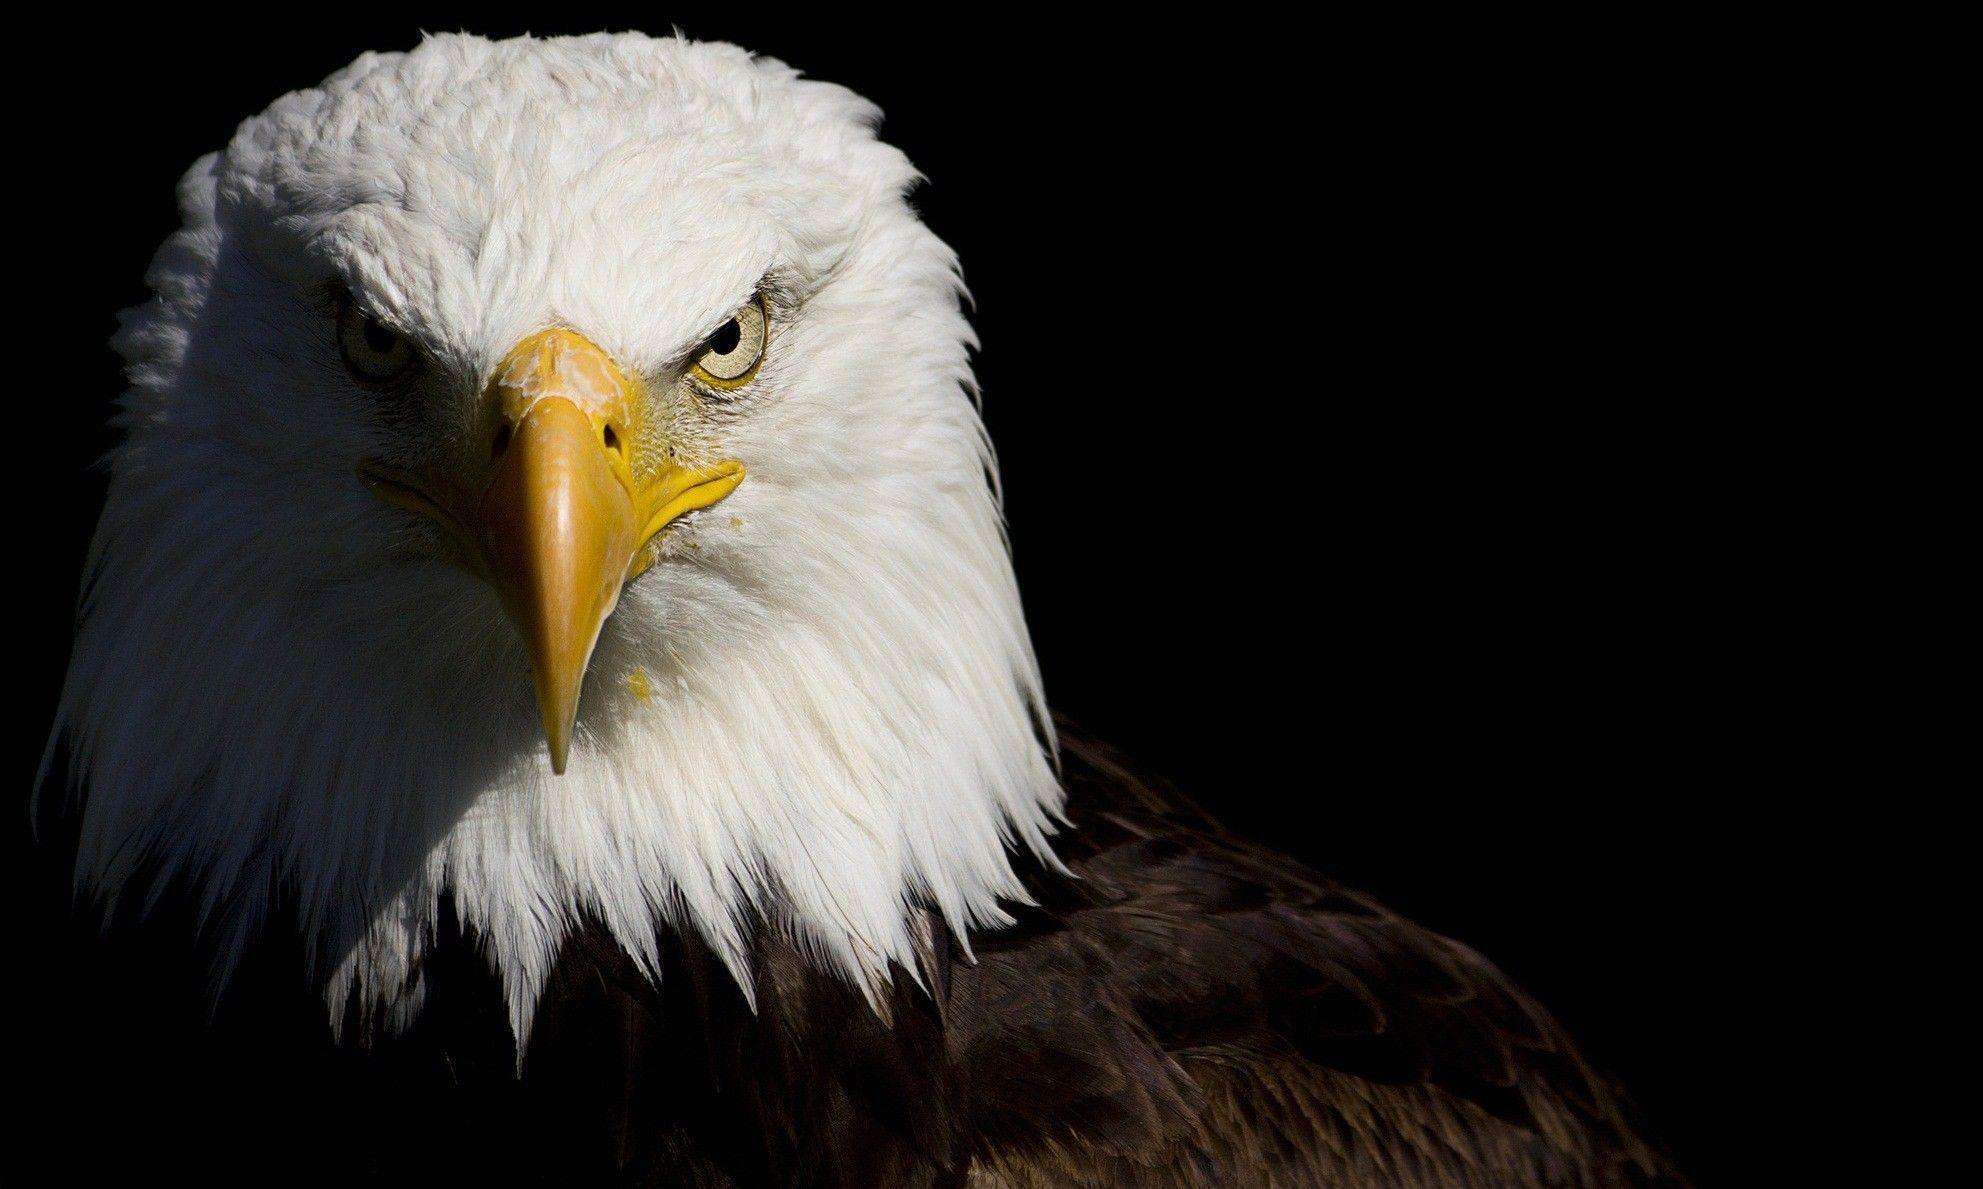 Eagle HD Desktop Wallpapers - Top Free Eagle HD Desktop ...